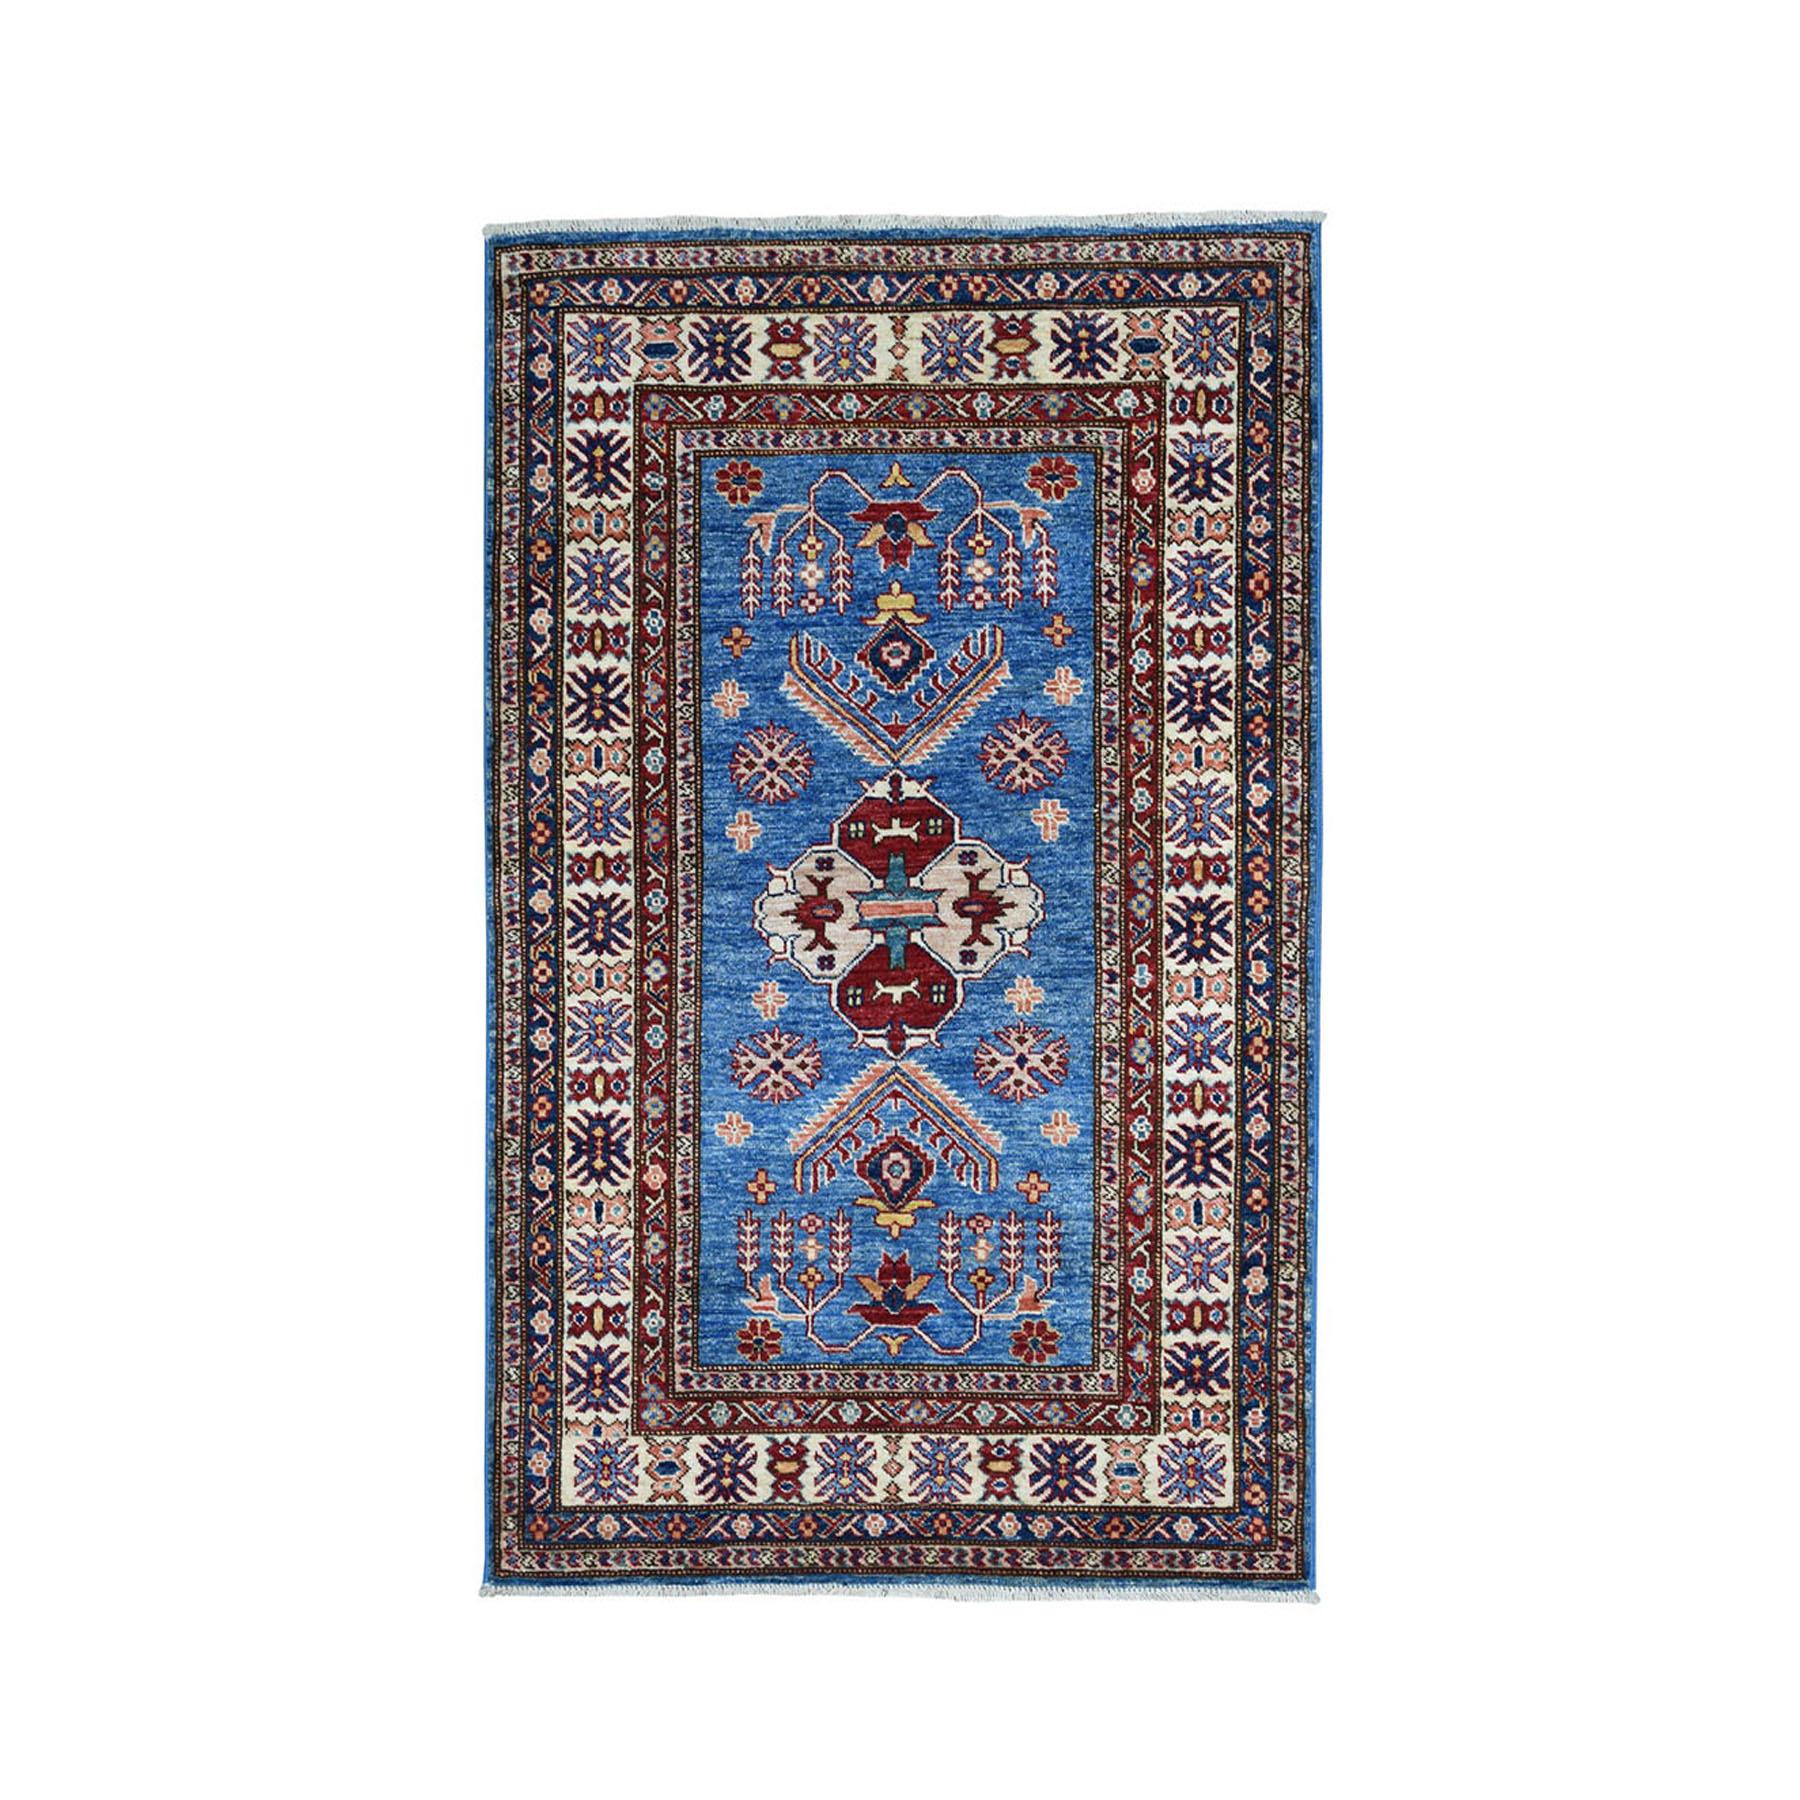 "3'3""X4'10"" Blue Super Kazak Pure Wool Geometric Design Hand-Knotted Oriental Rug moae09cc"